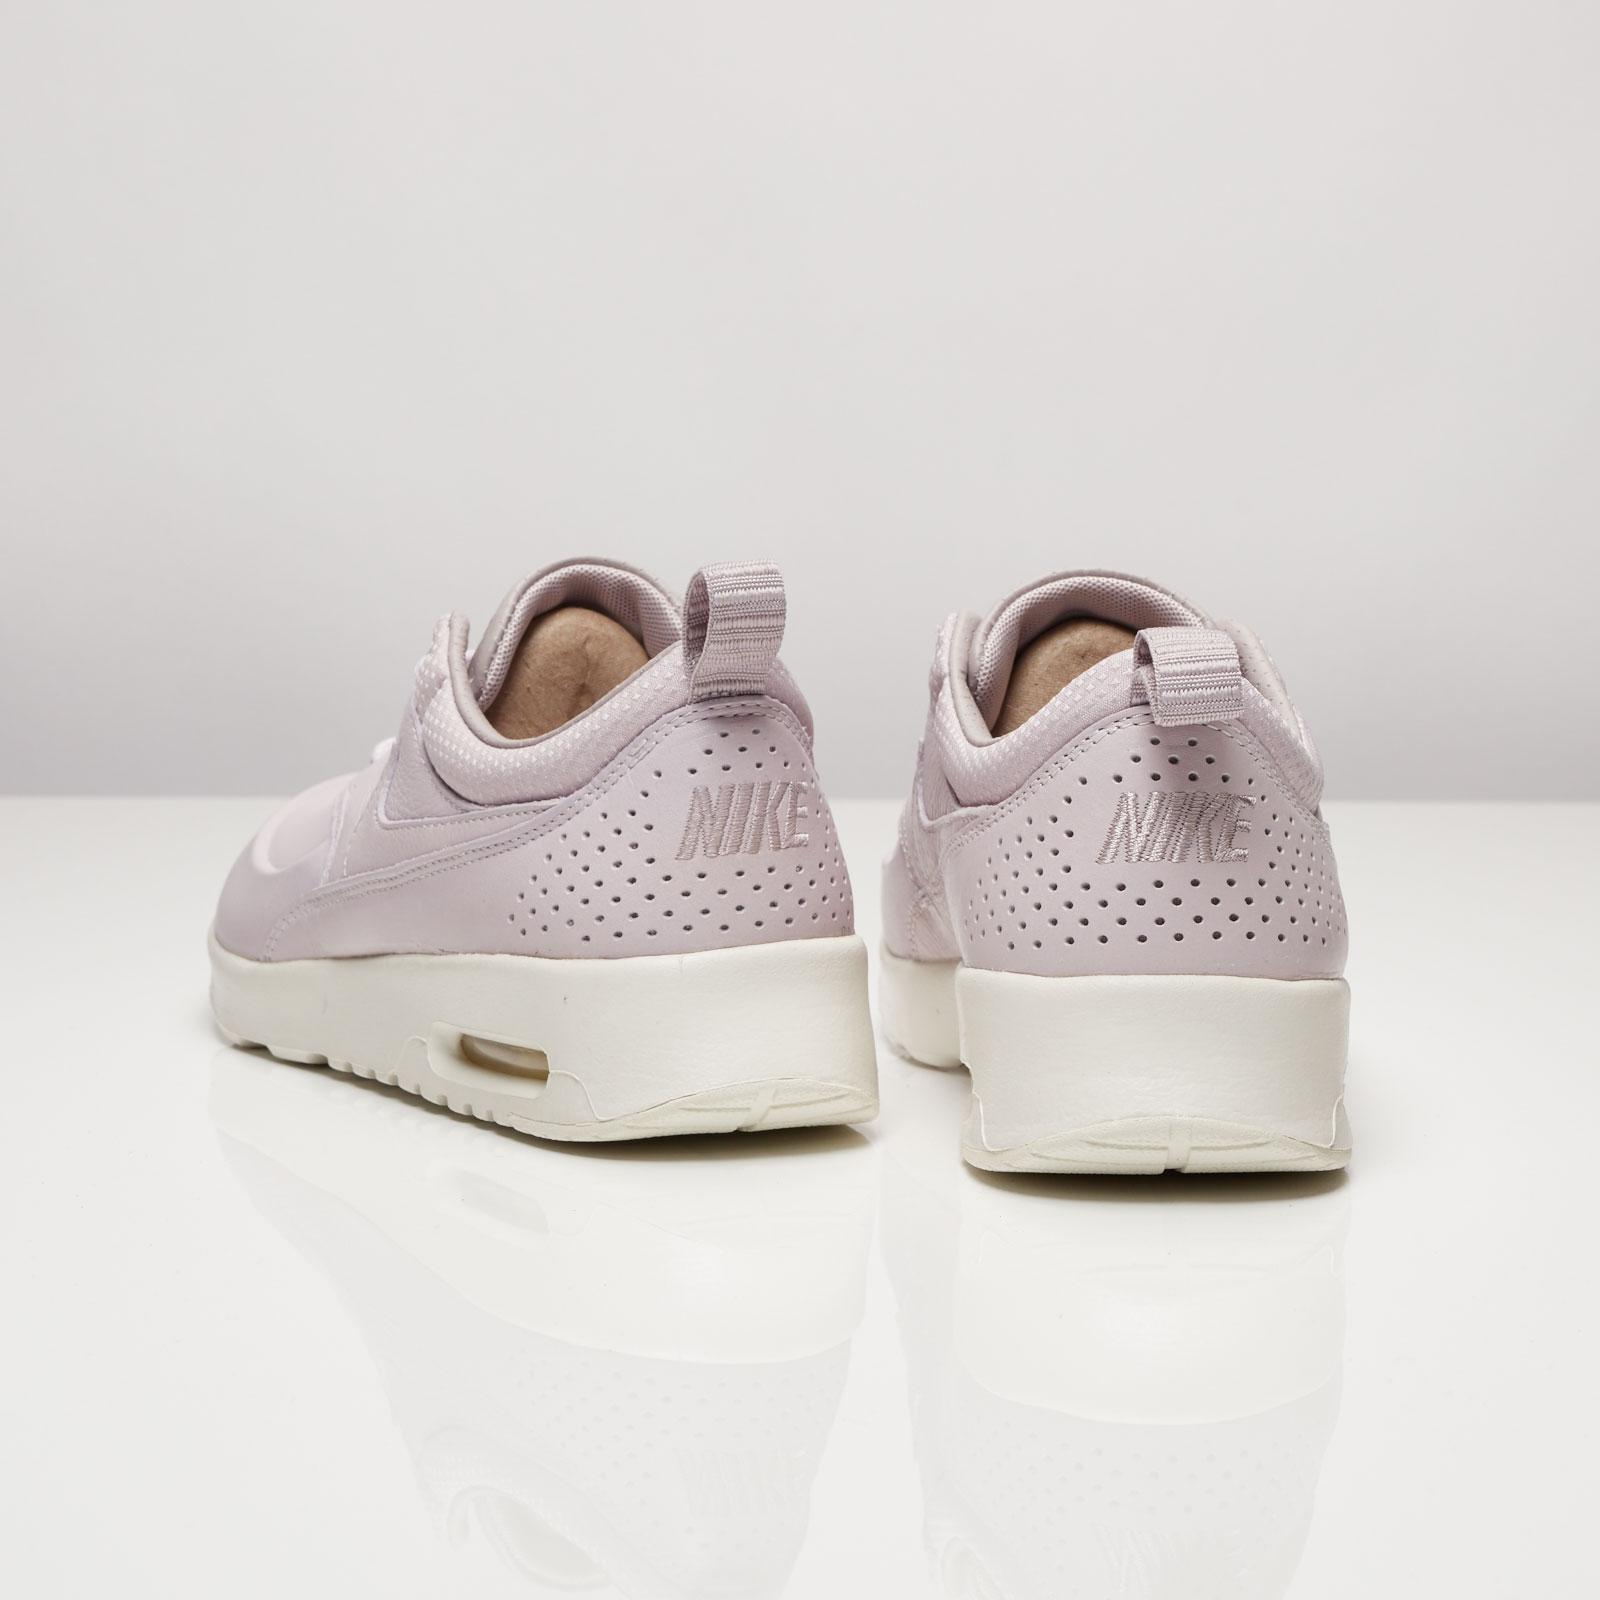 0211284c68f4 Nike Wmns Air Max Thea Pinnacle - 839611-500 - Sneakersnstuff ...